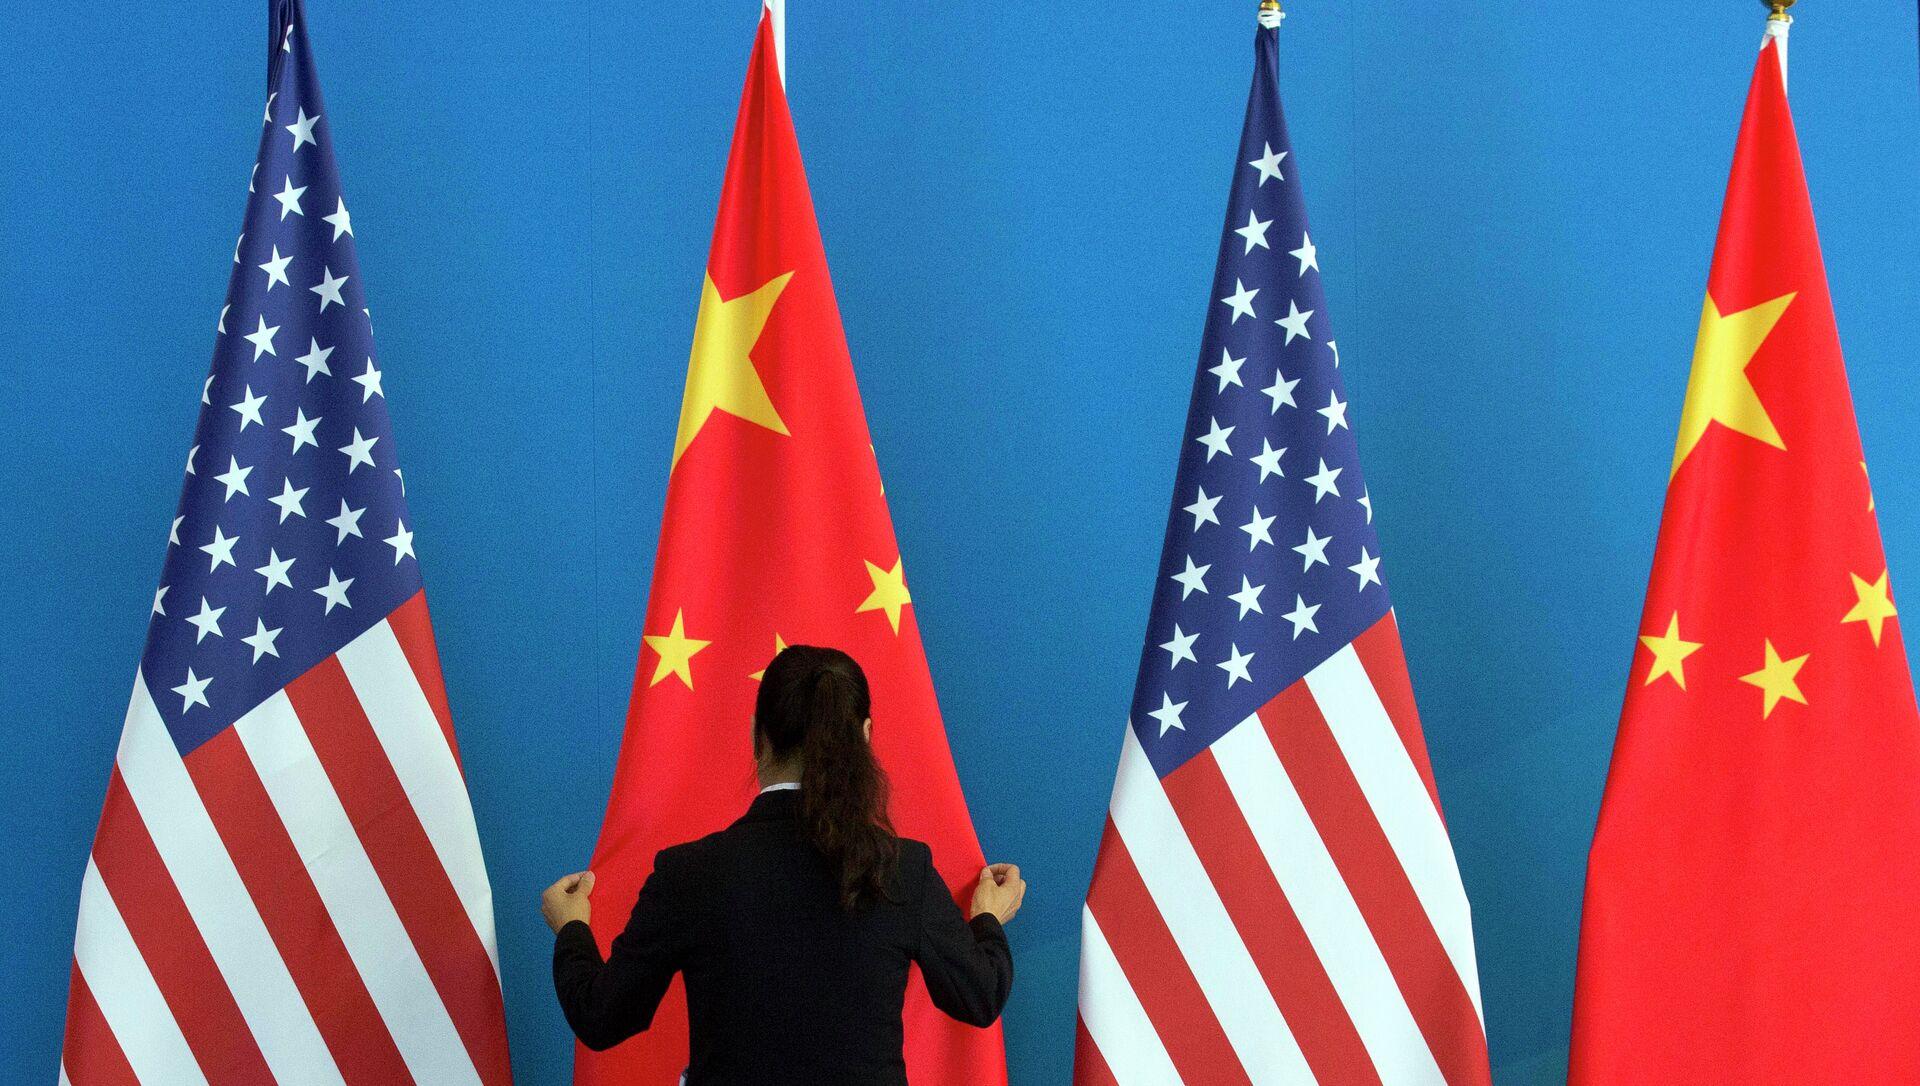 米国と中国 - Sputnik 日本, 1920, 03.10.2021